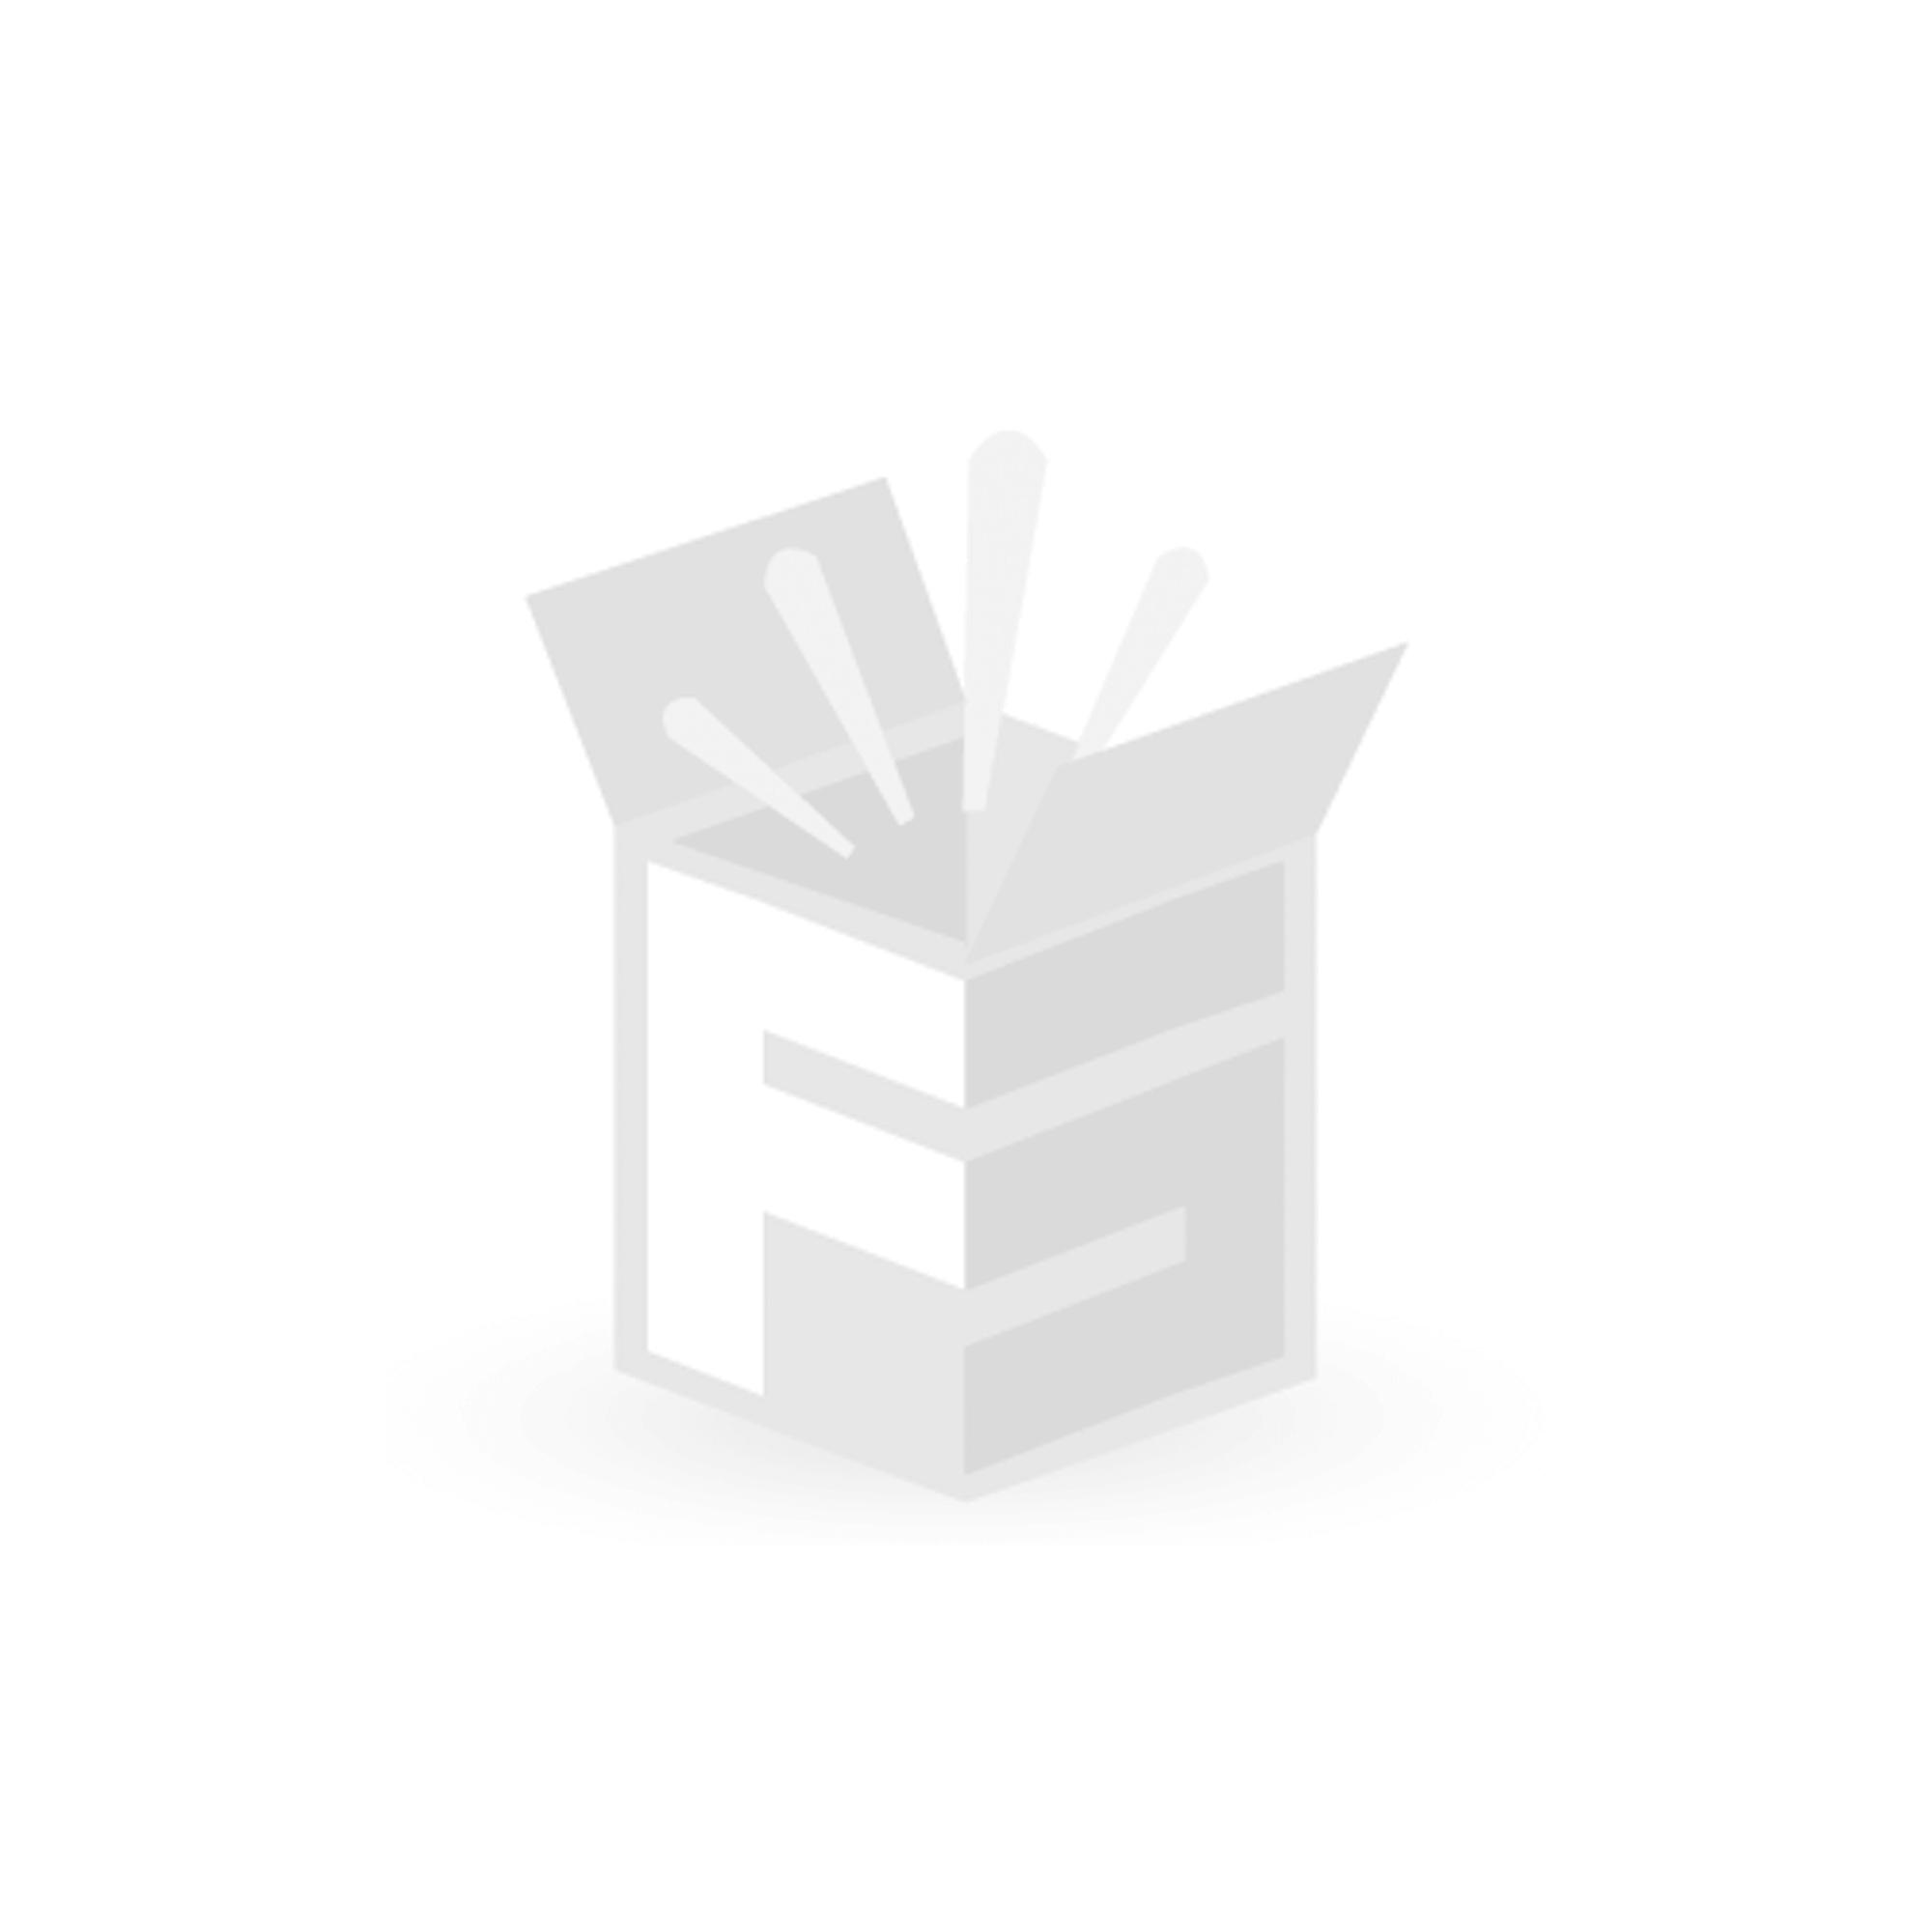 bosch akku bohrschrauber gsr 12v 15 2x 1 5 ah inkl tasche. Black Bedroom Furniture Sets. Home Design Ideas